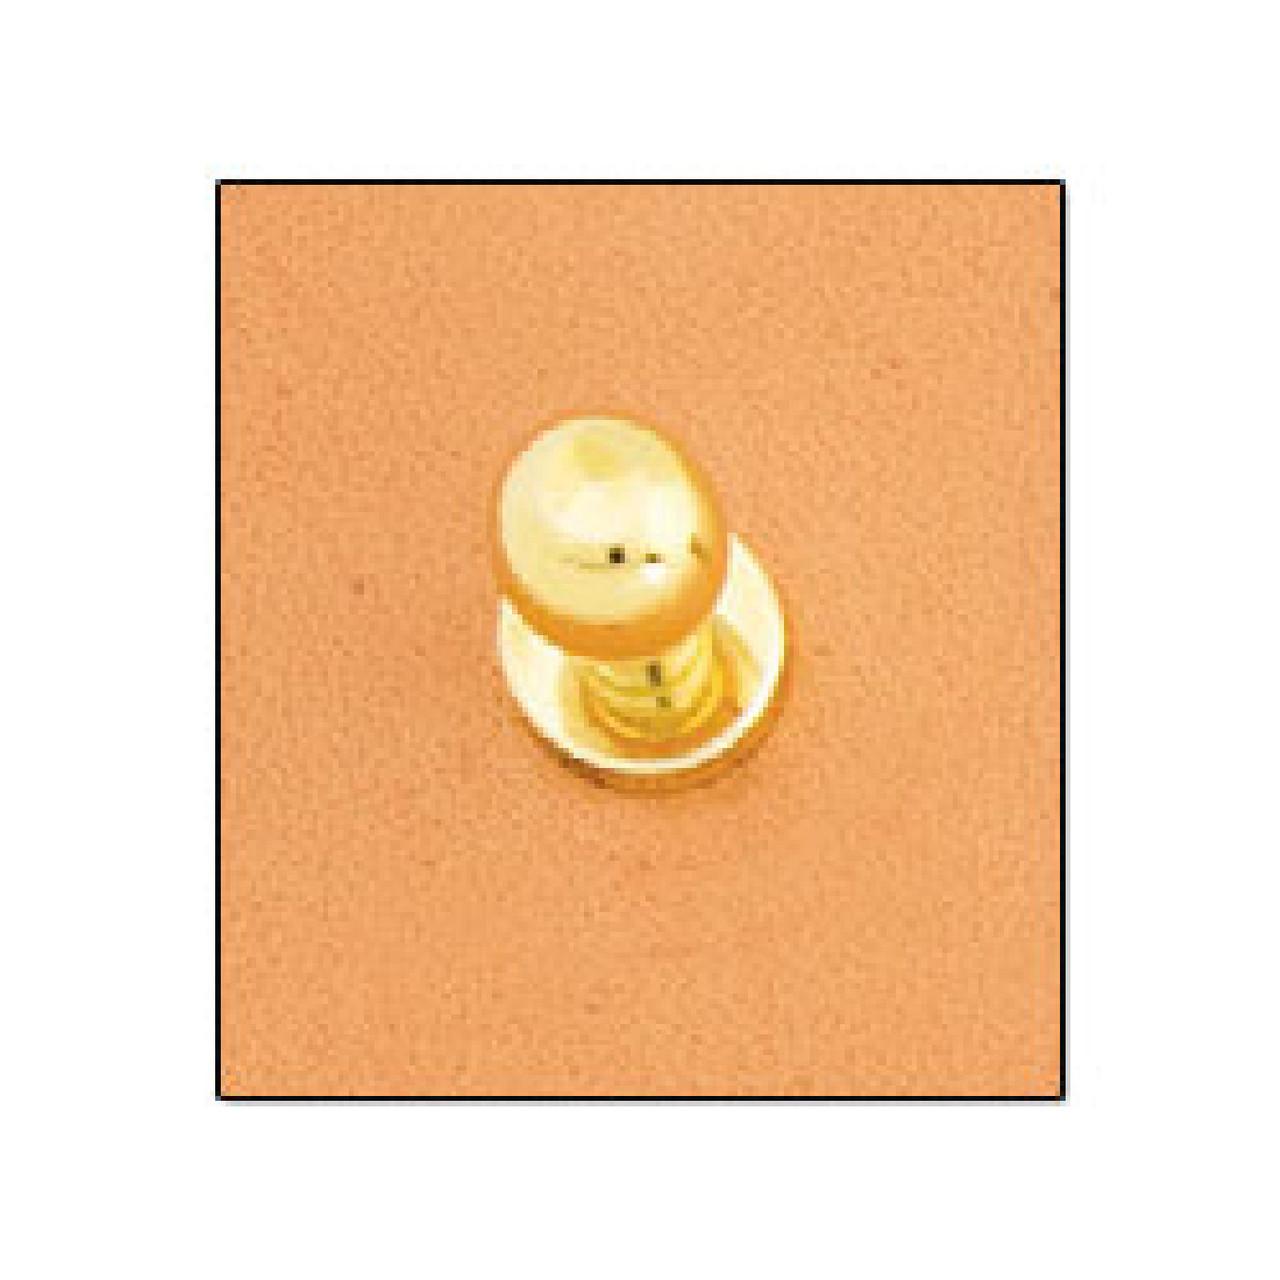 "Button Stud 1/4"" (7mm) Screwback Nickel Free Brass Plate"